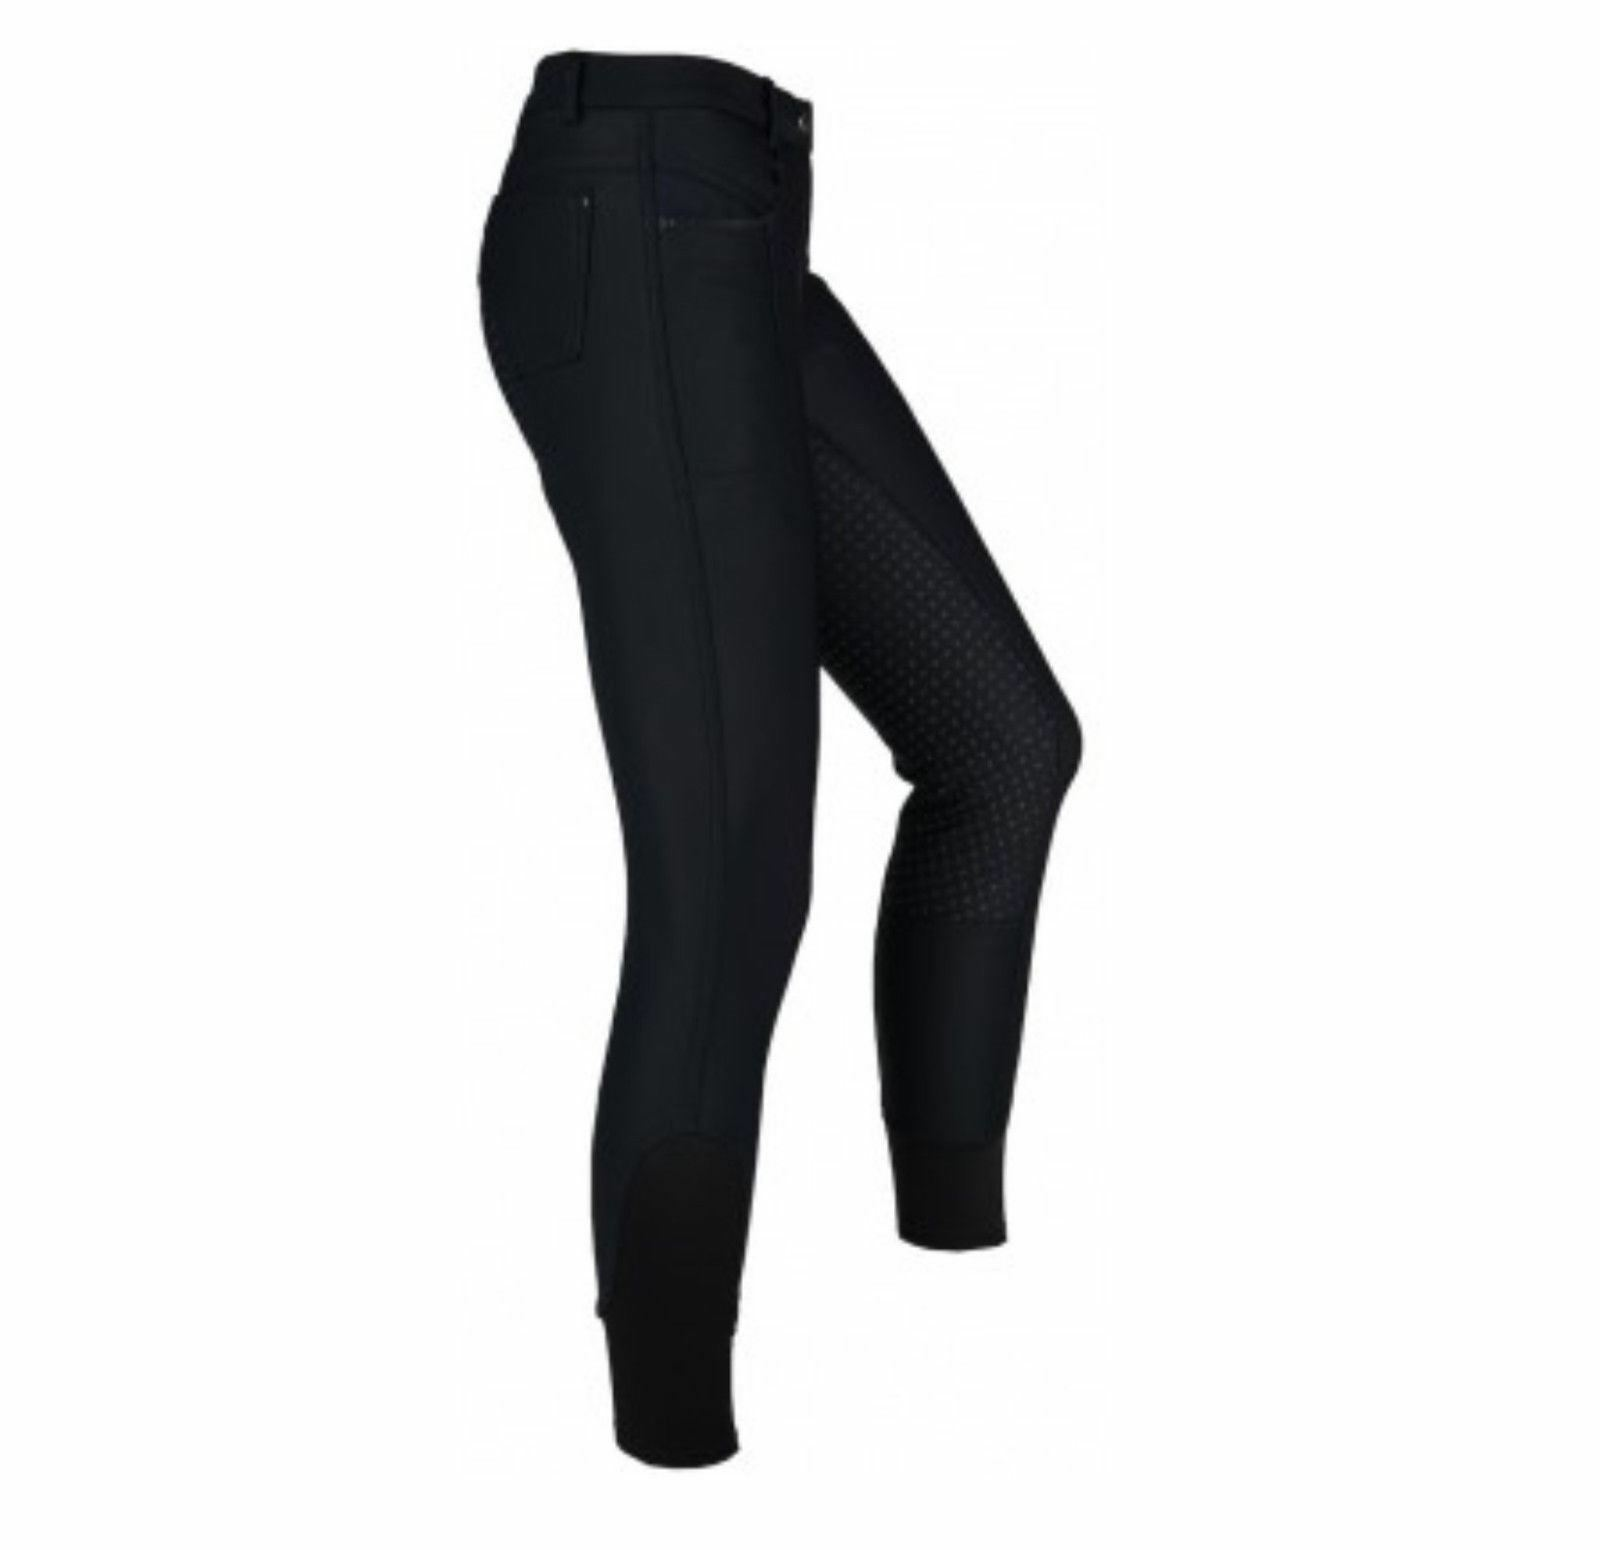 Horka Shania Damas Equitación Ecuestre Pantalones De Montar De Silicona repelente al agua